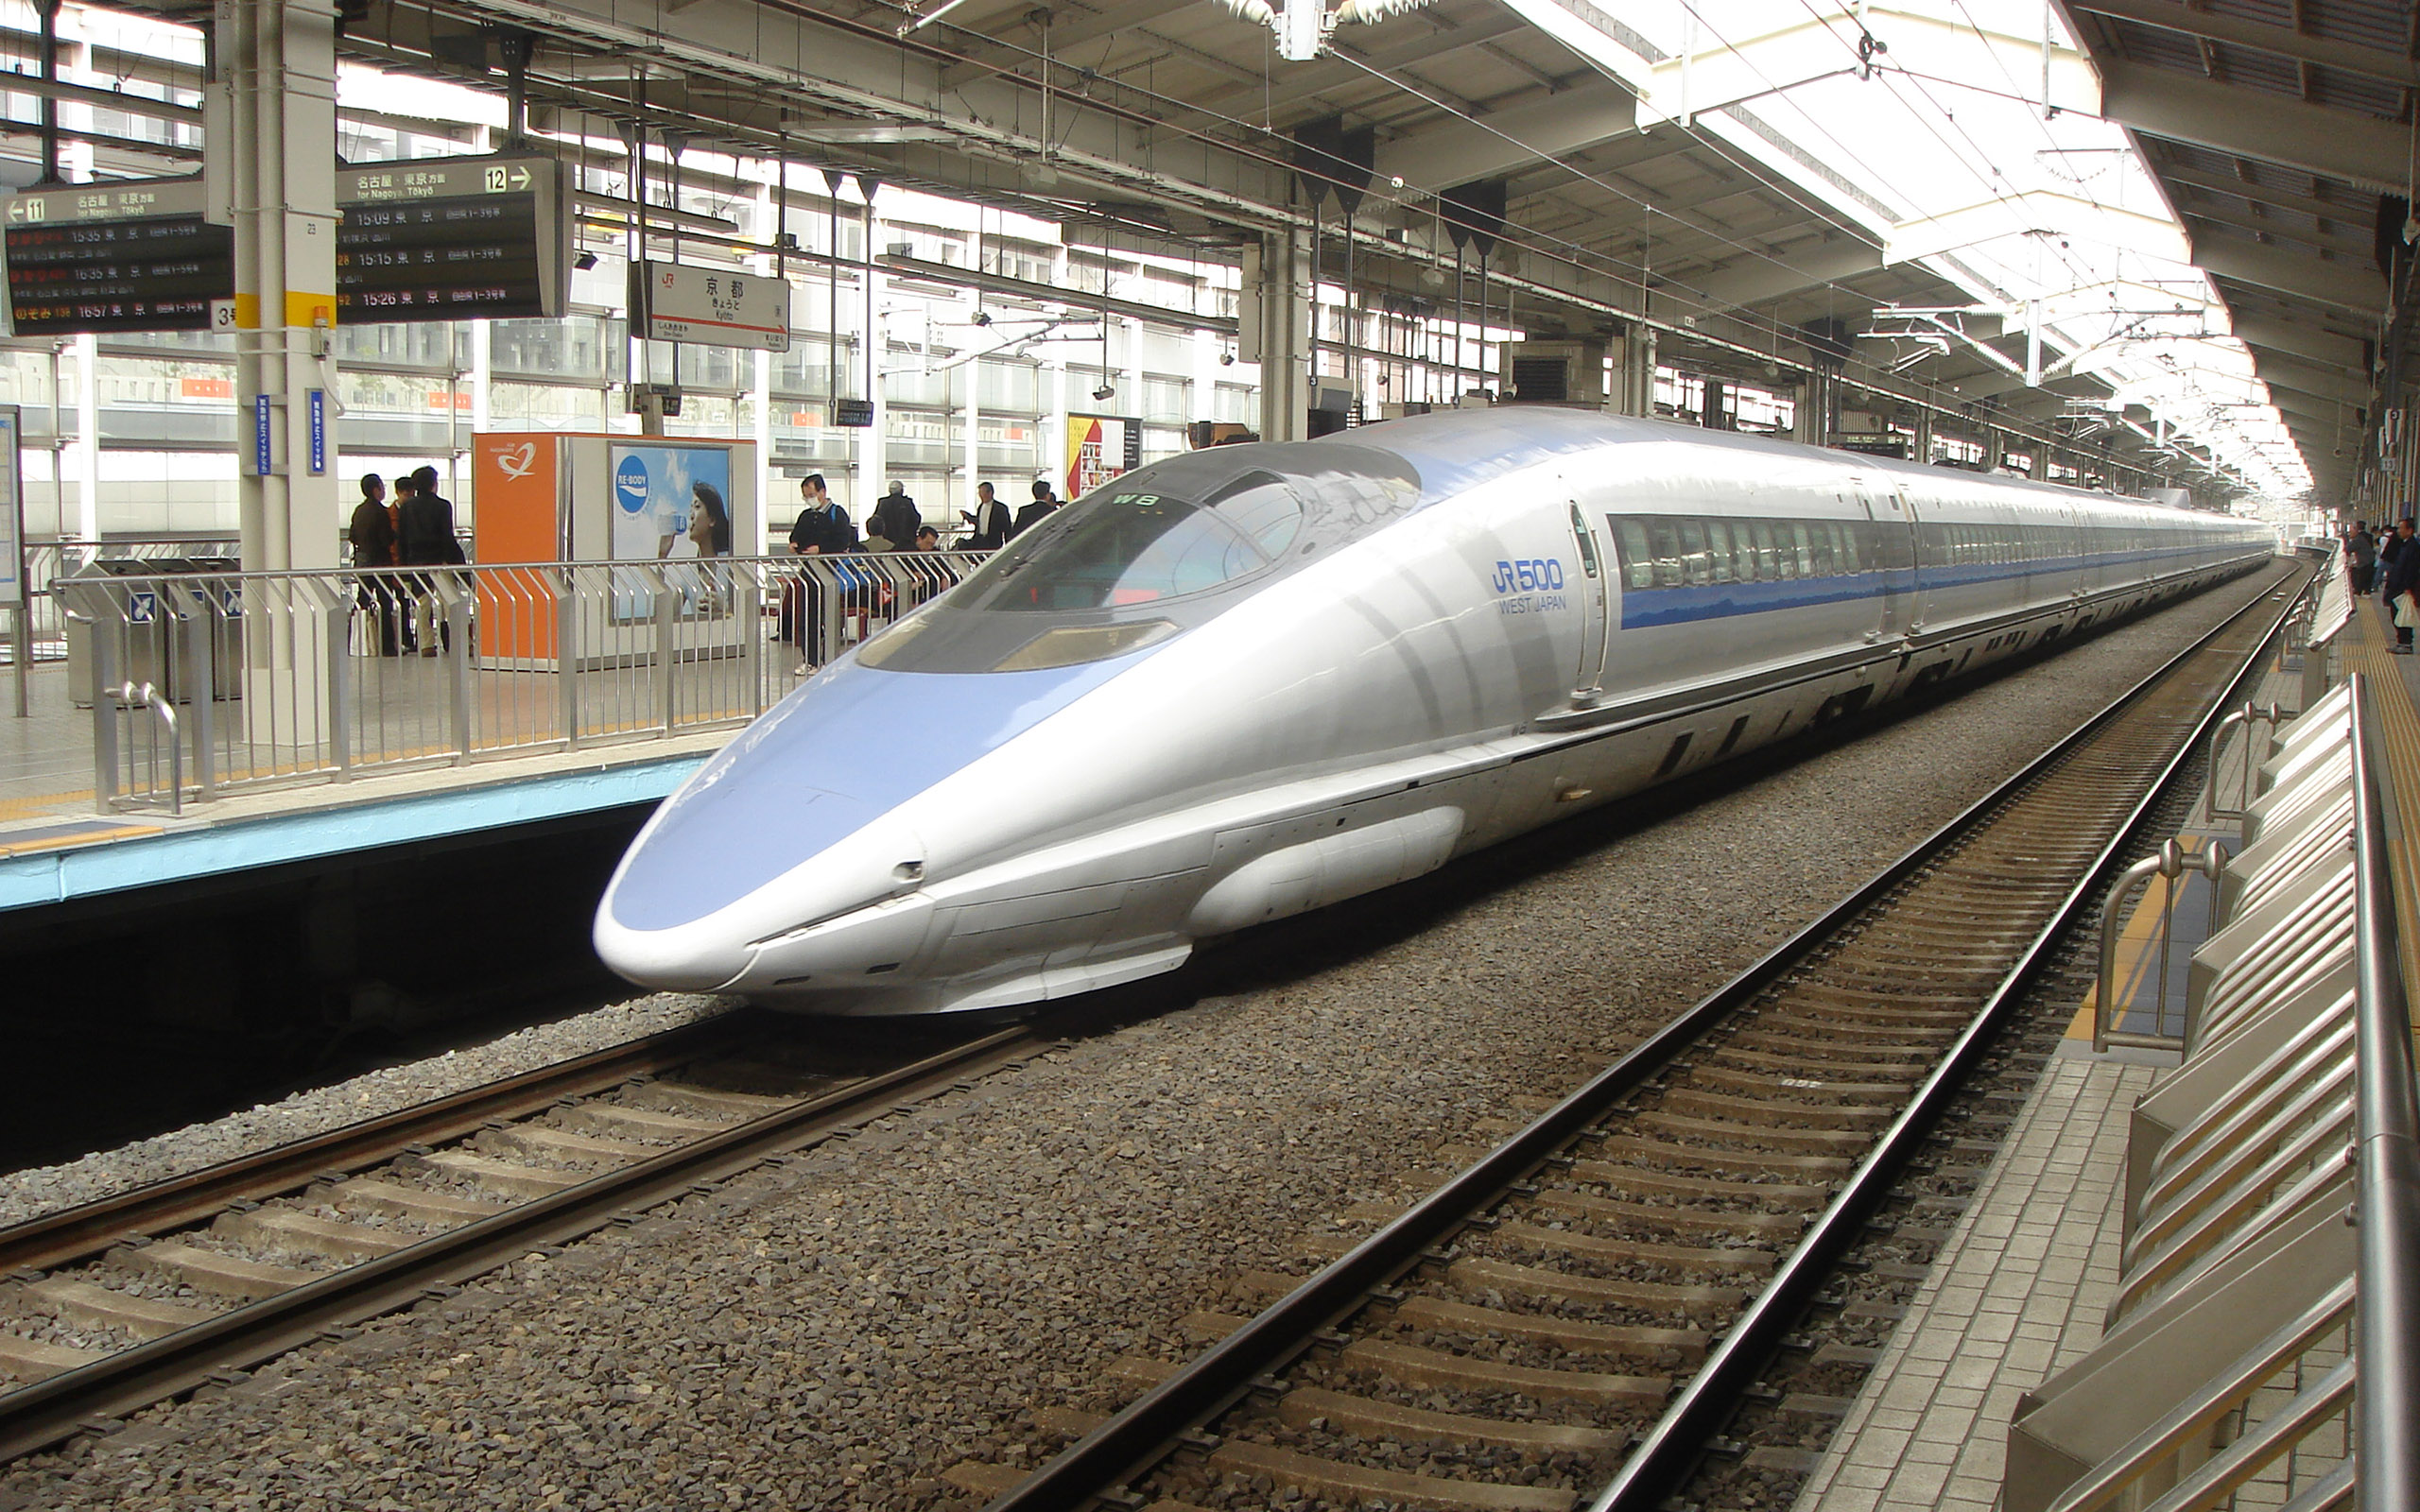 Pentingnya Menggunakan JR Pass Ketika Berkunjung Ke Jepang image